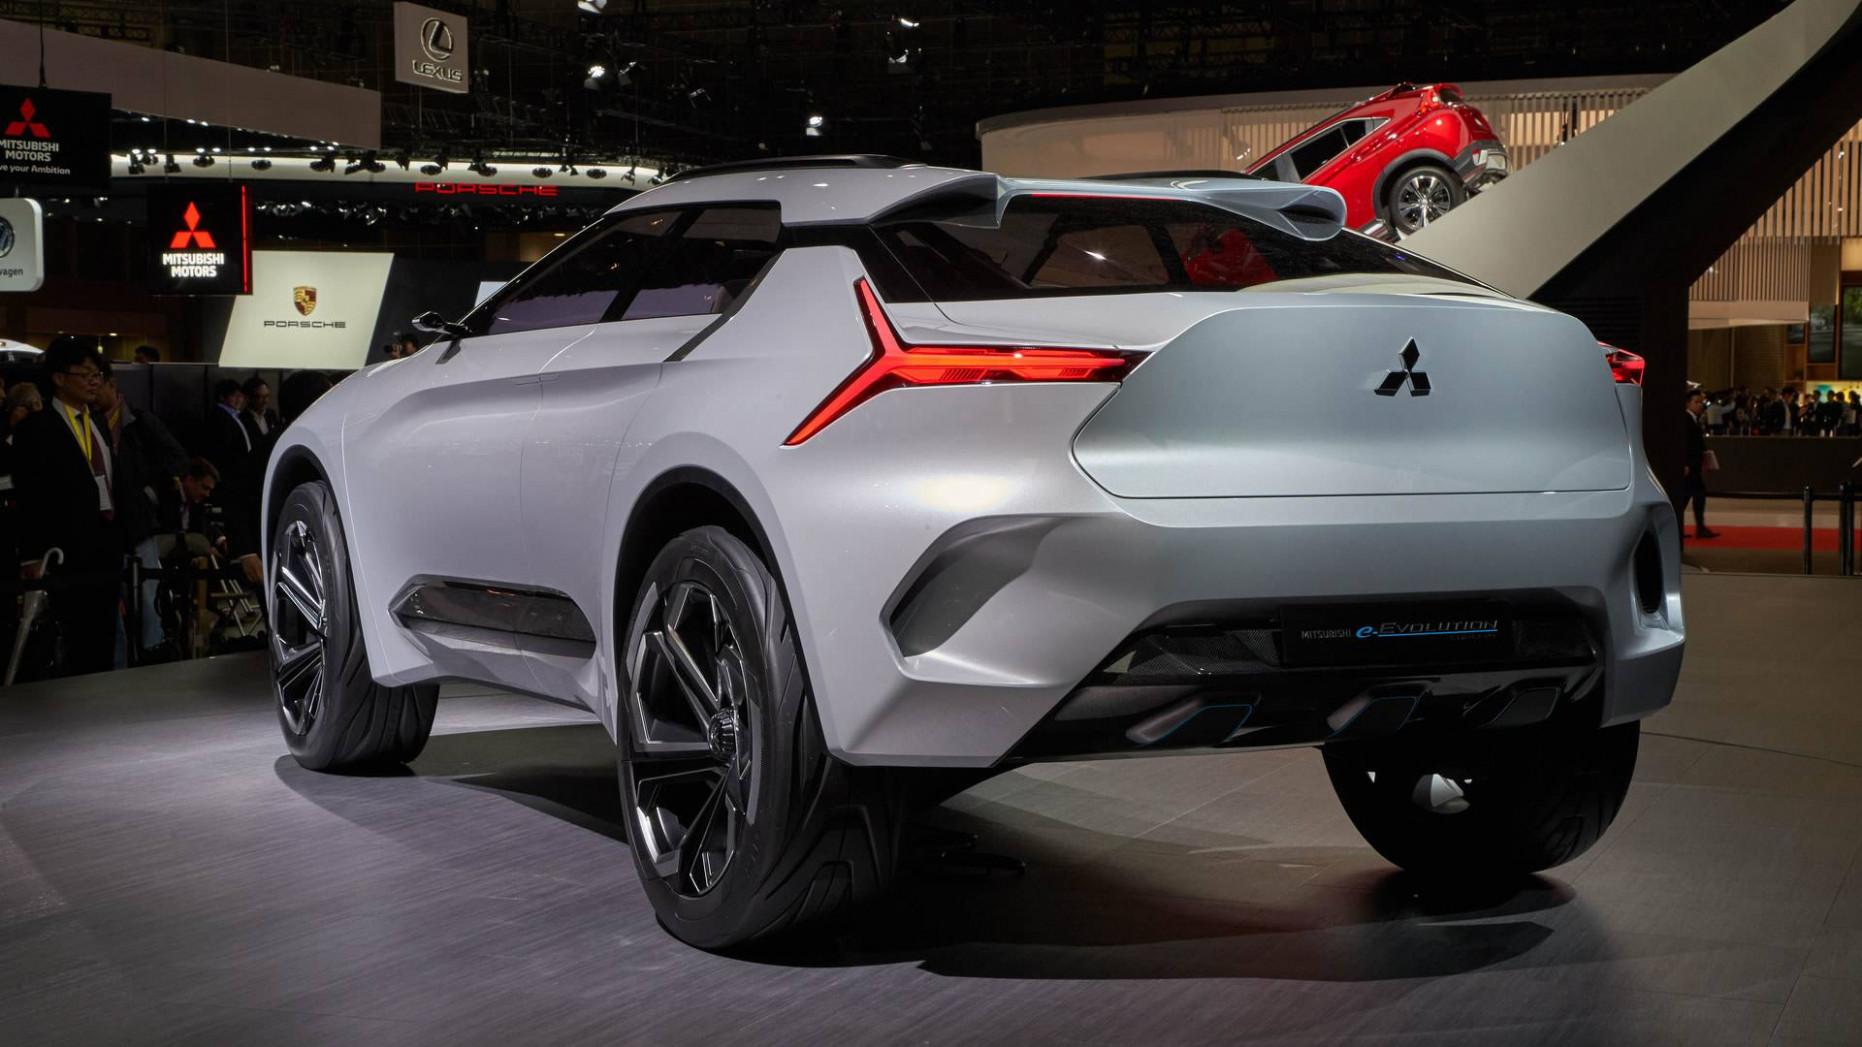 Review 2022 Mitsubishi Eclipse R | New Cars Design